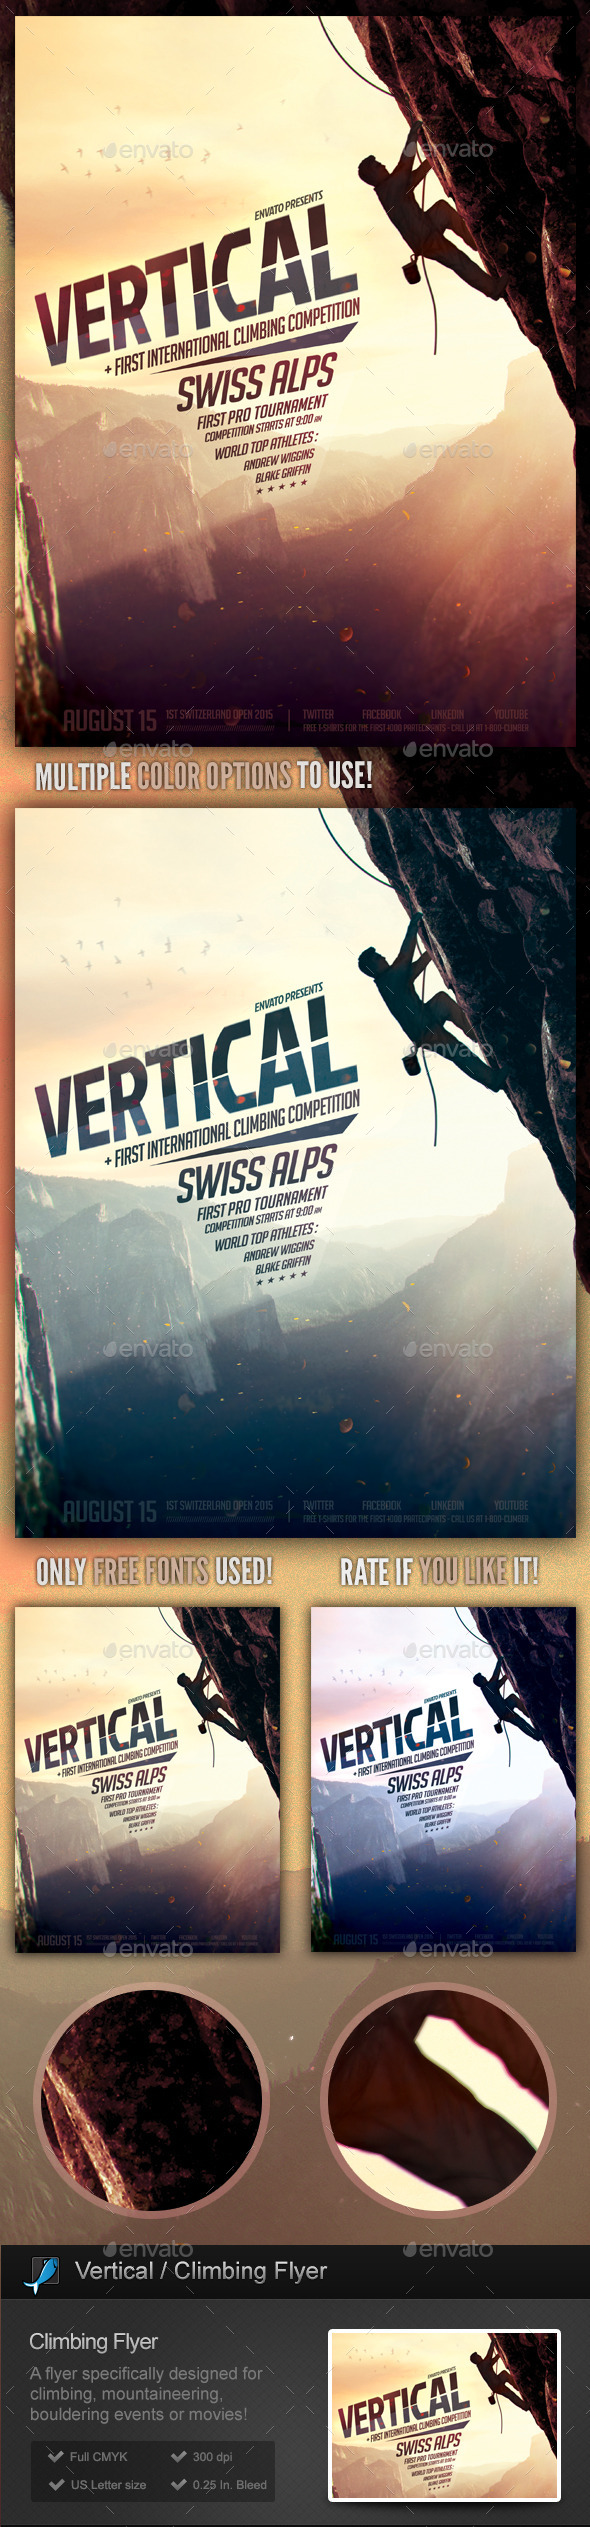 Vertical - Climbing, Bouldering Flyer Template - Sports Events